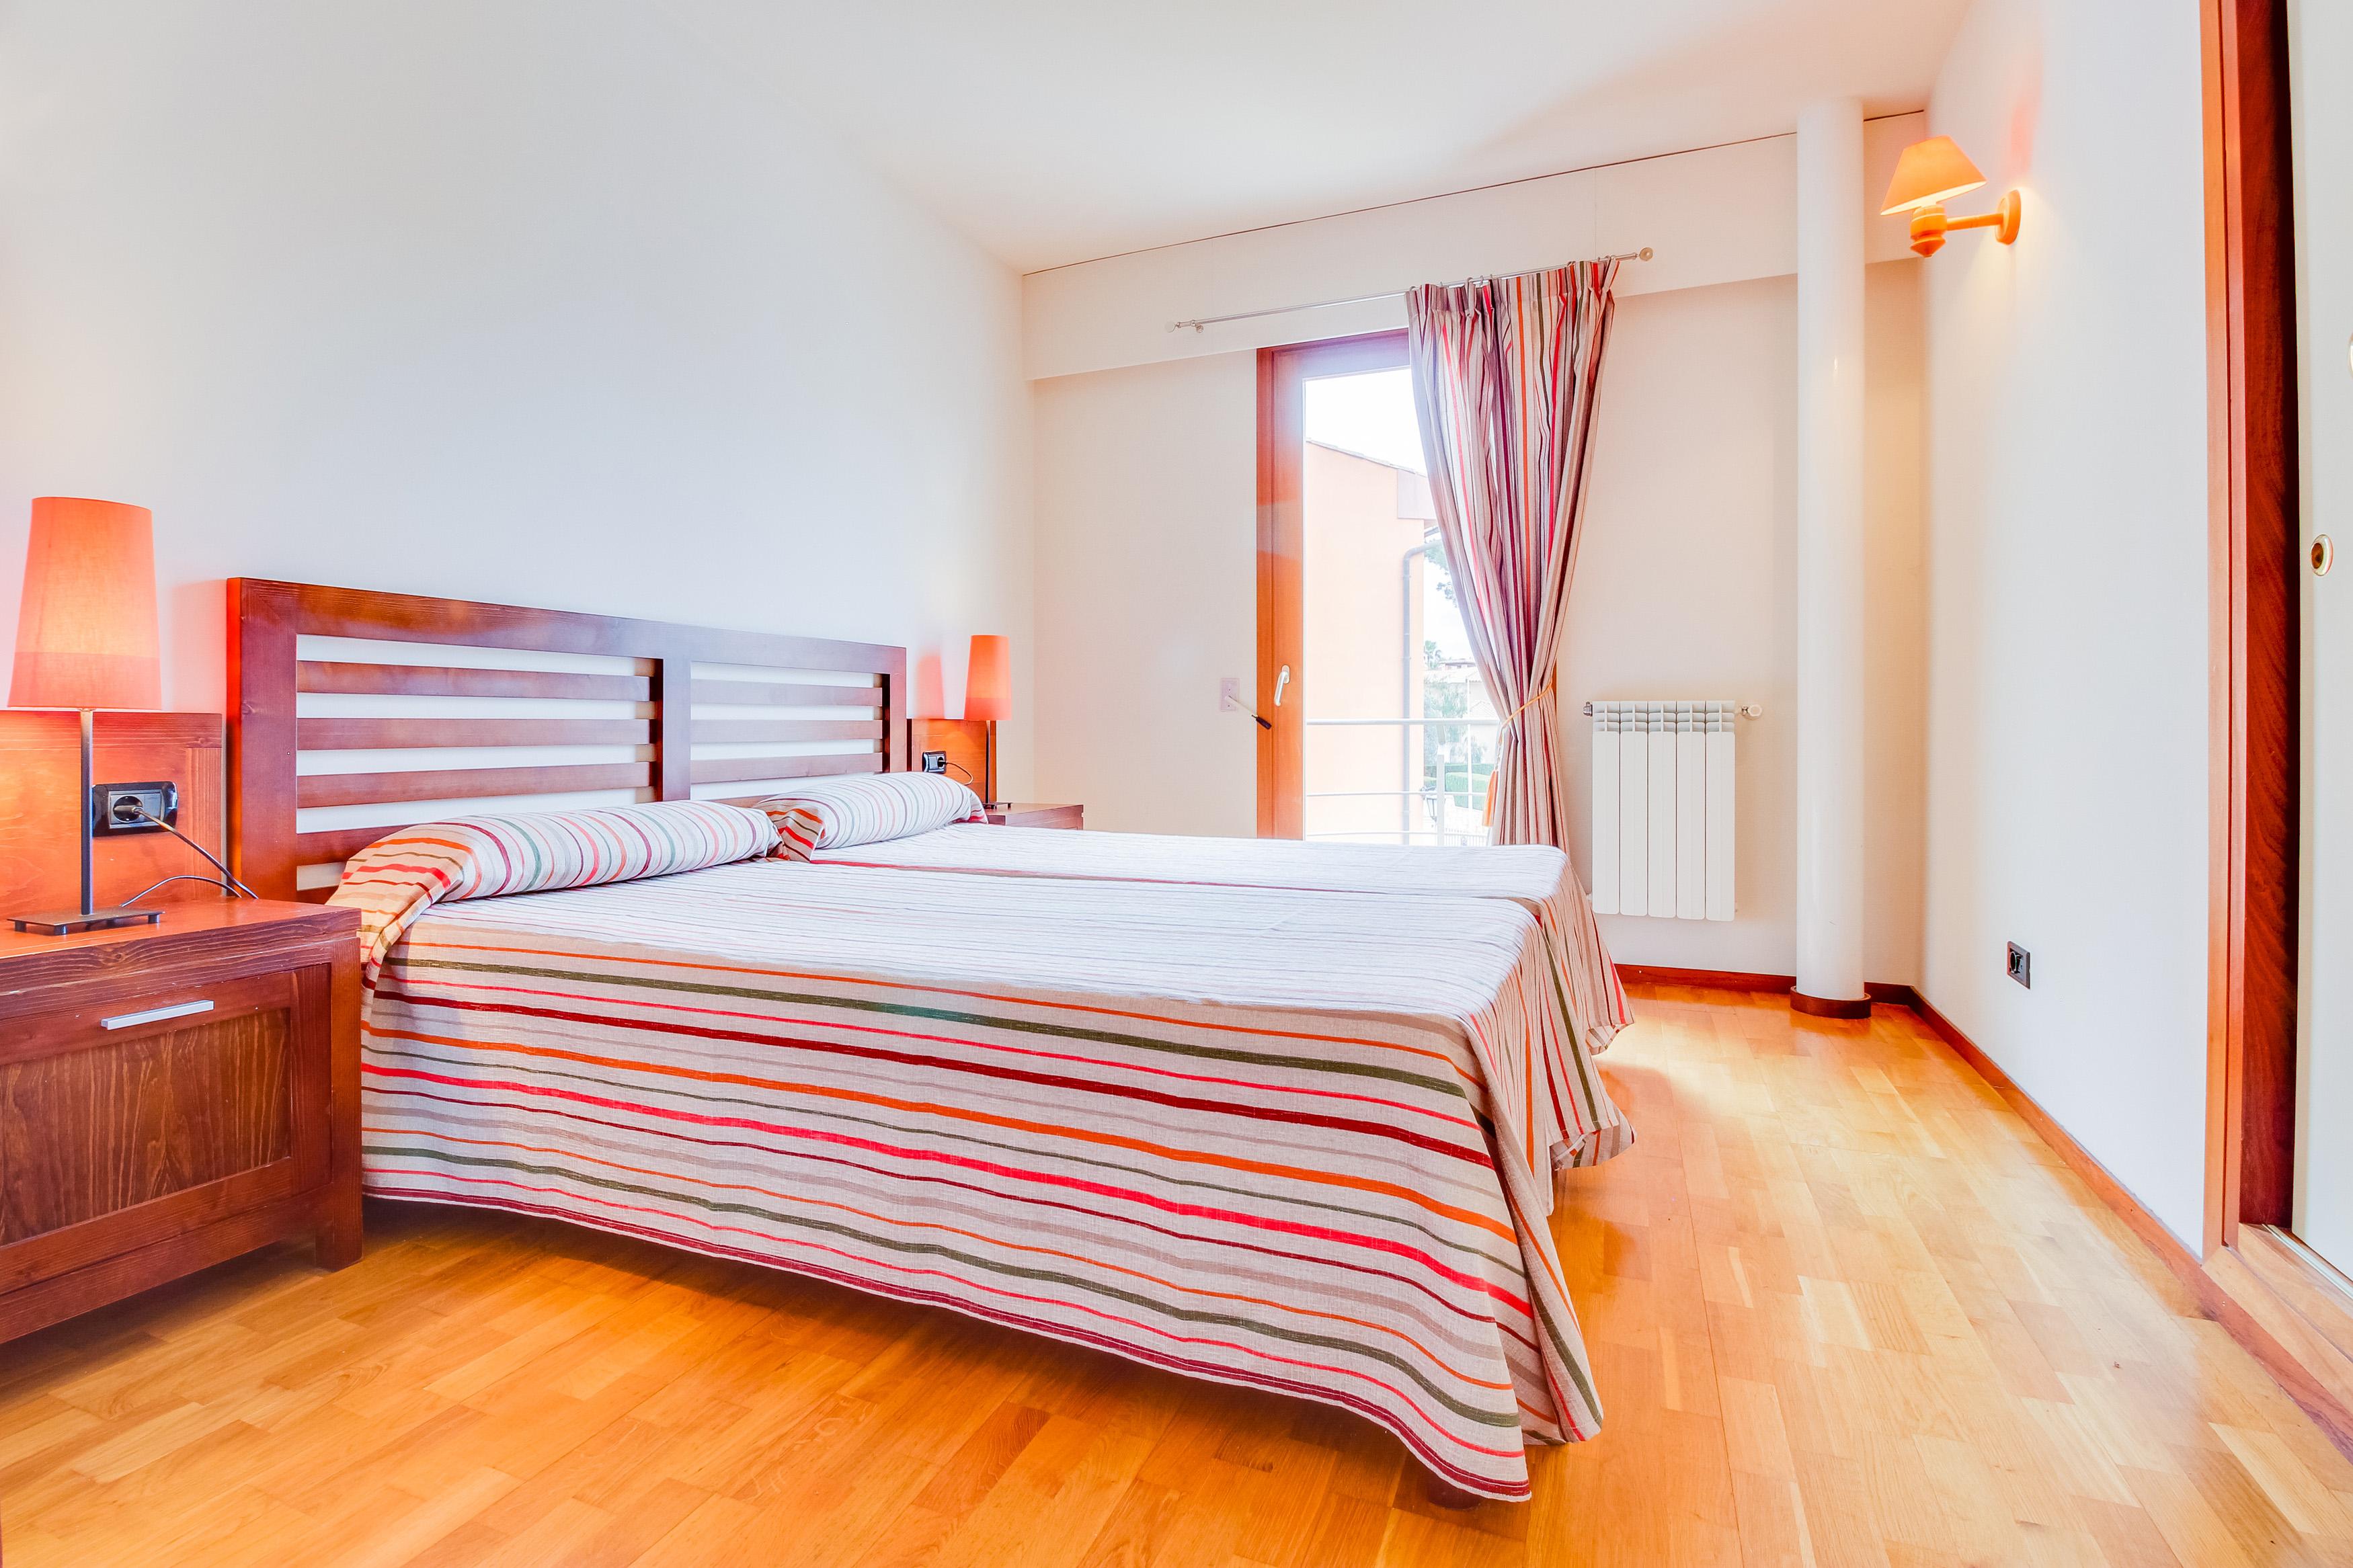 Apartment Villa Cala Blava photo 20399425